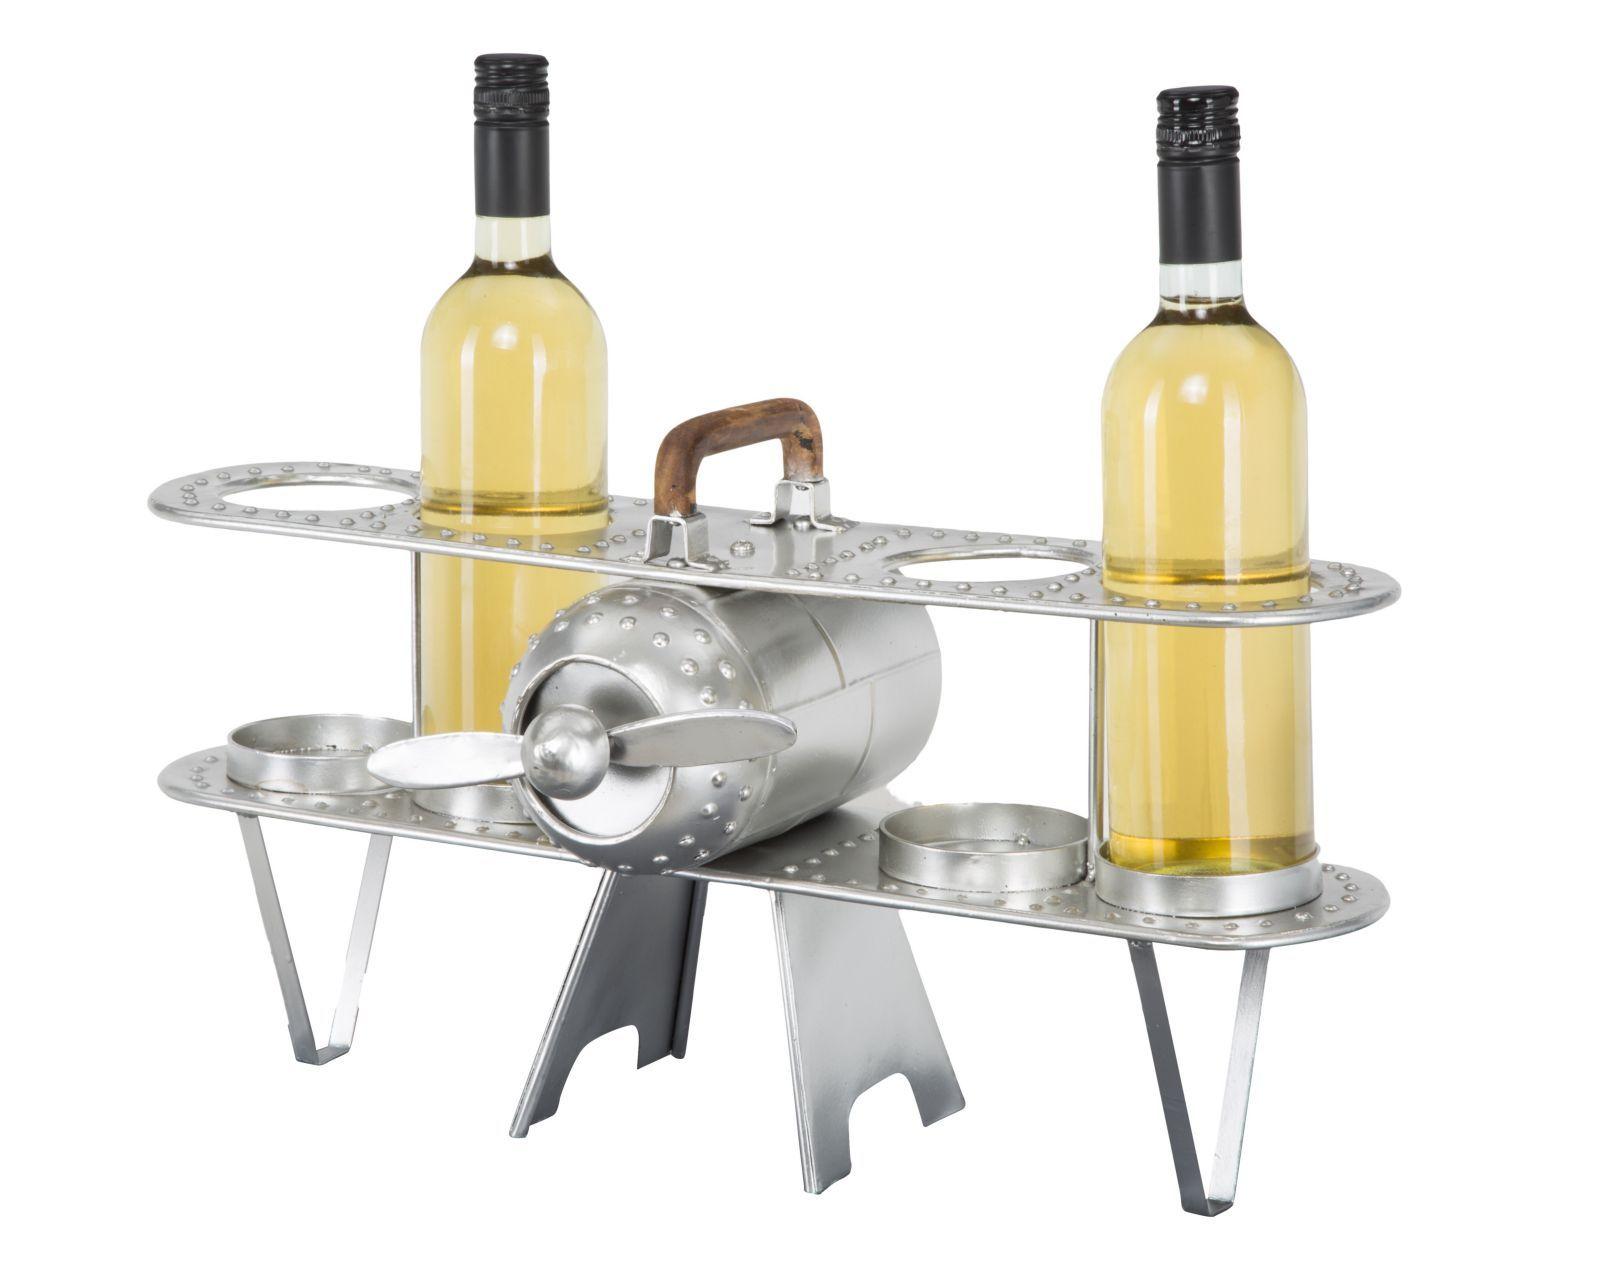 #MauroFerrettiSrl 0902250000 P/BOTTIGLIE MULTIPLO AVIATOR CM 52,1X21,5X28.5 #mauroferrettisrl #home #homedecor #decor #casa #arredo #arredamento #portabottiglie #aereo #aviator #plane #bottleholder #wine #industrial #iron #metal #newitem #newlook #italiansdoitbetter